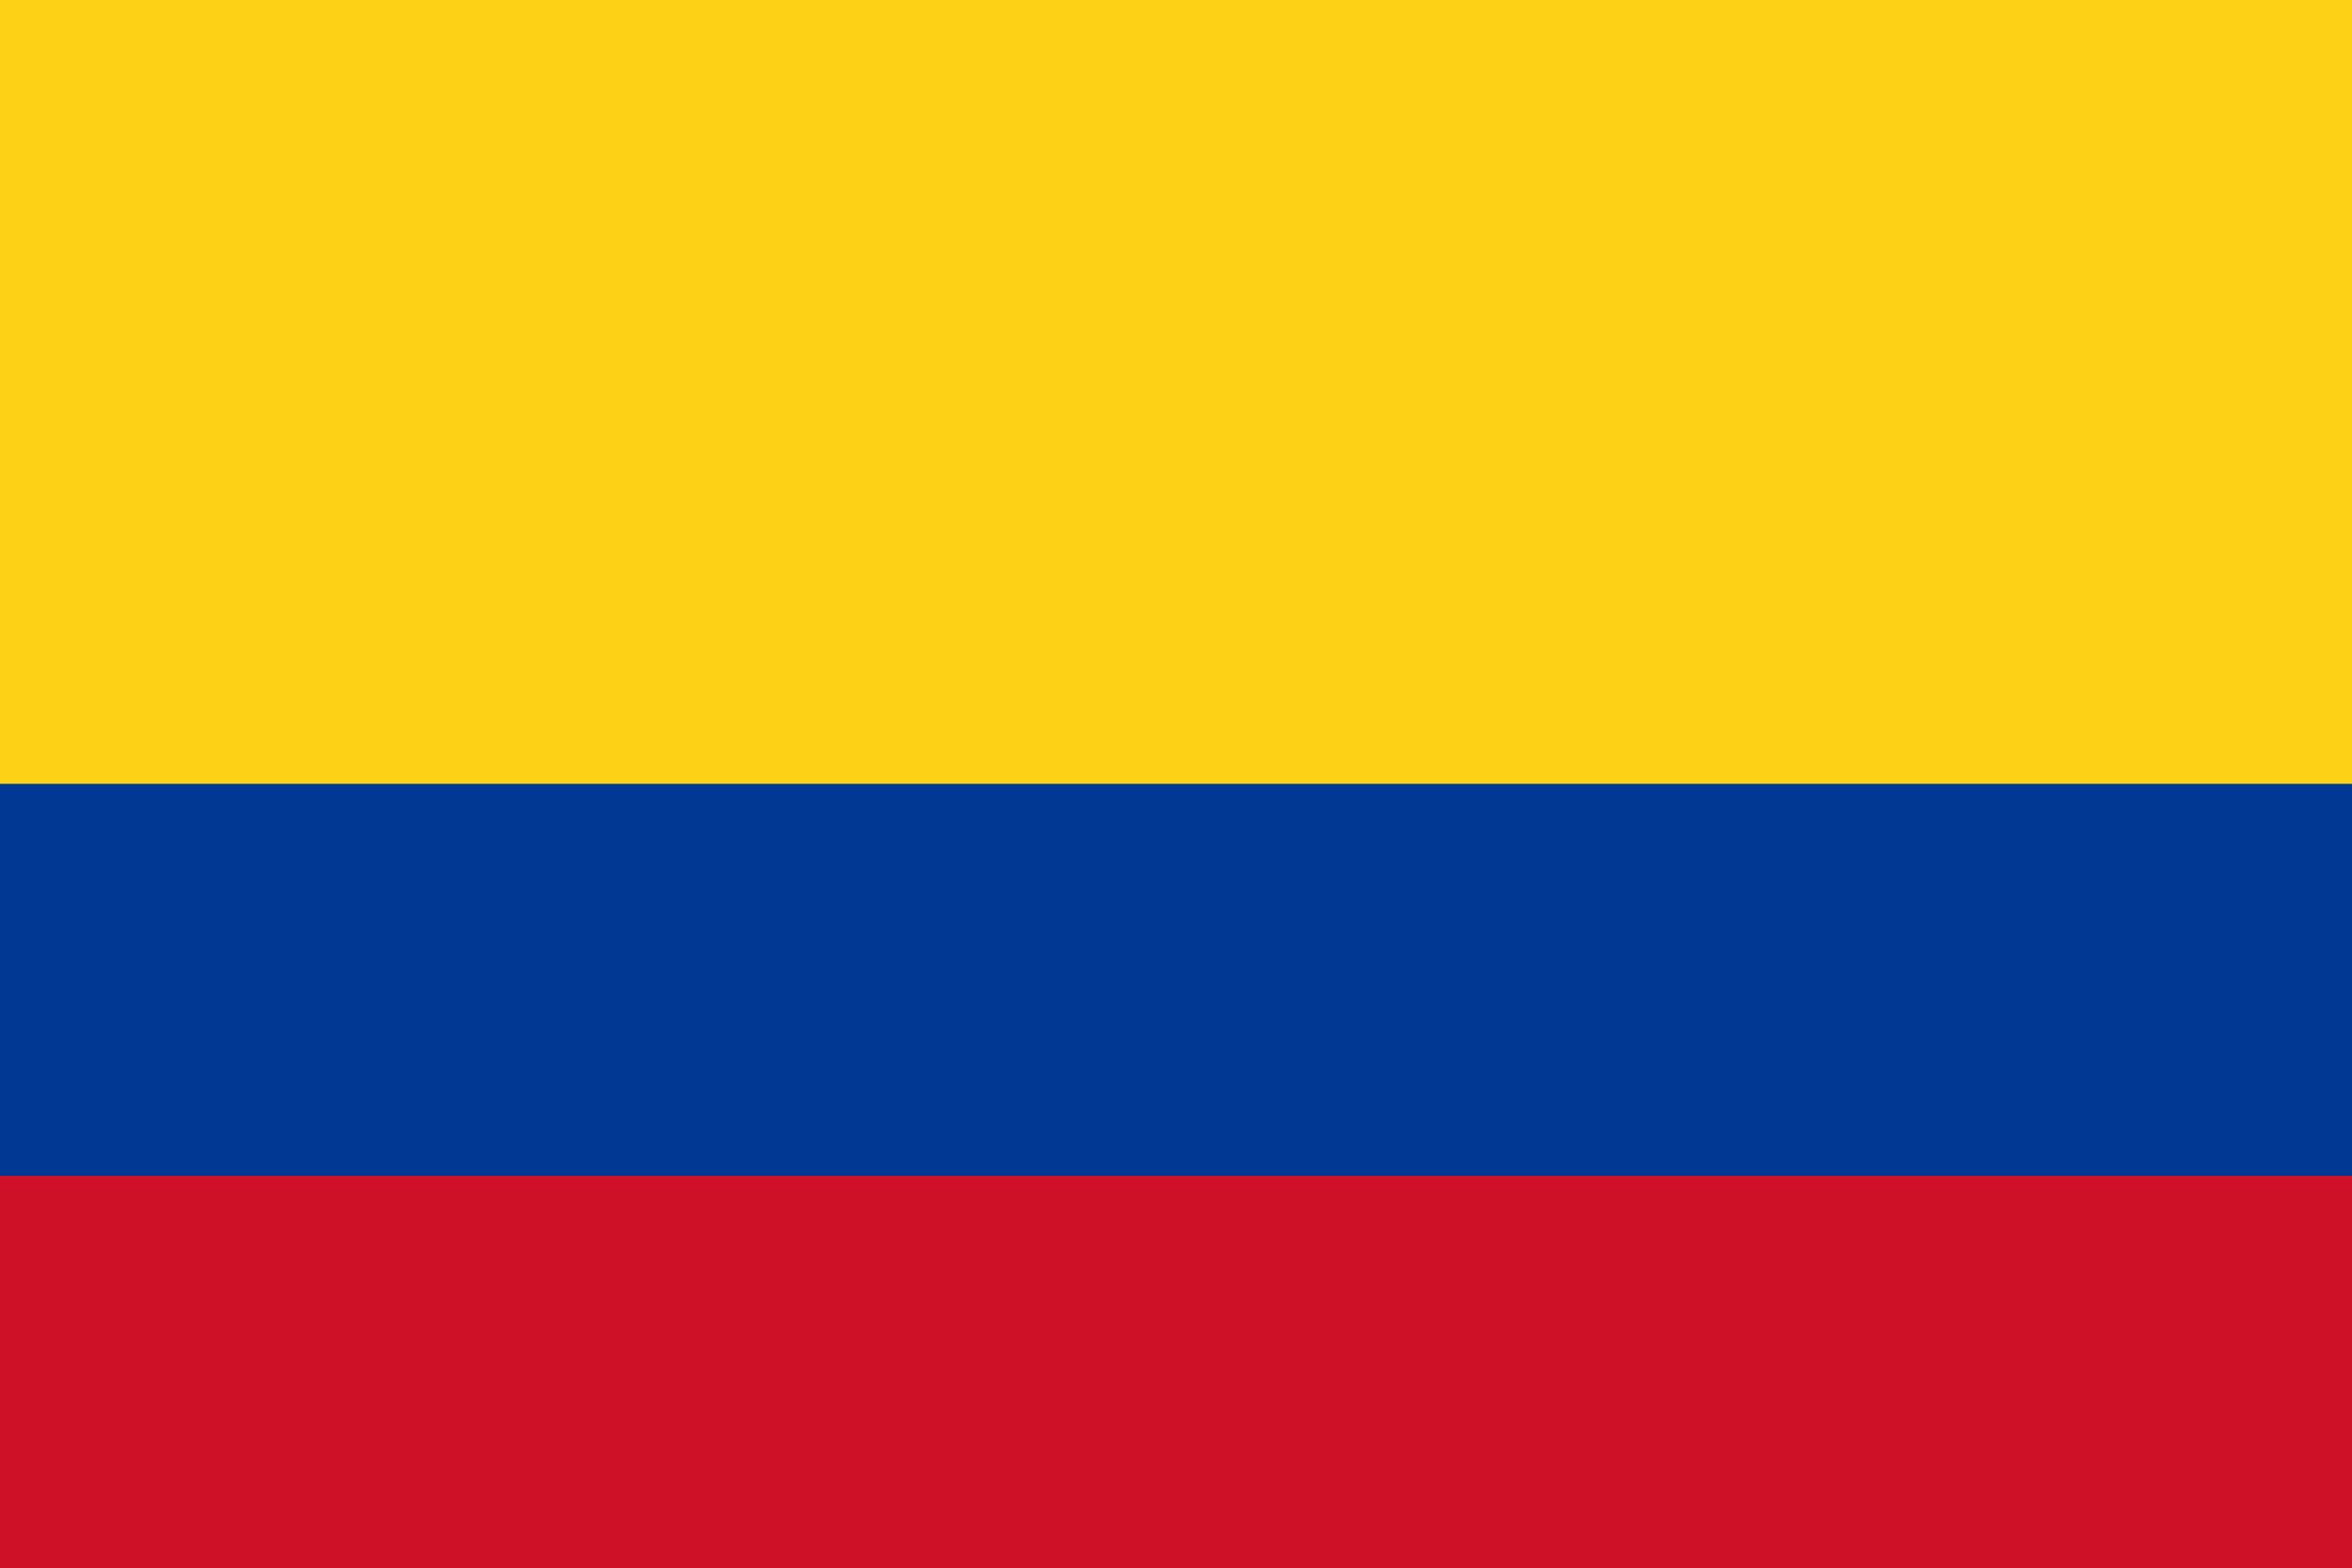 colombia, país, Brasão de armas, logotipo, símbolo - Papéis de parede HD - Professor-falken.com